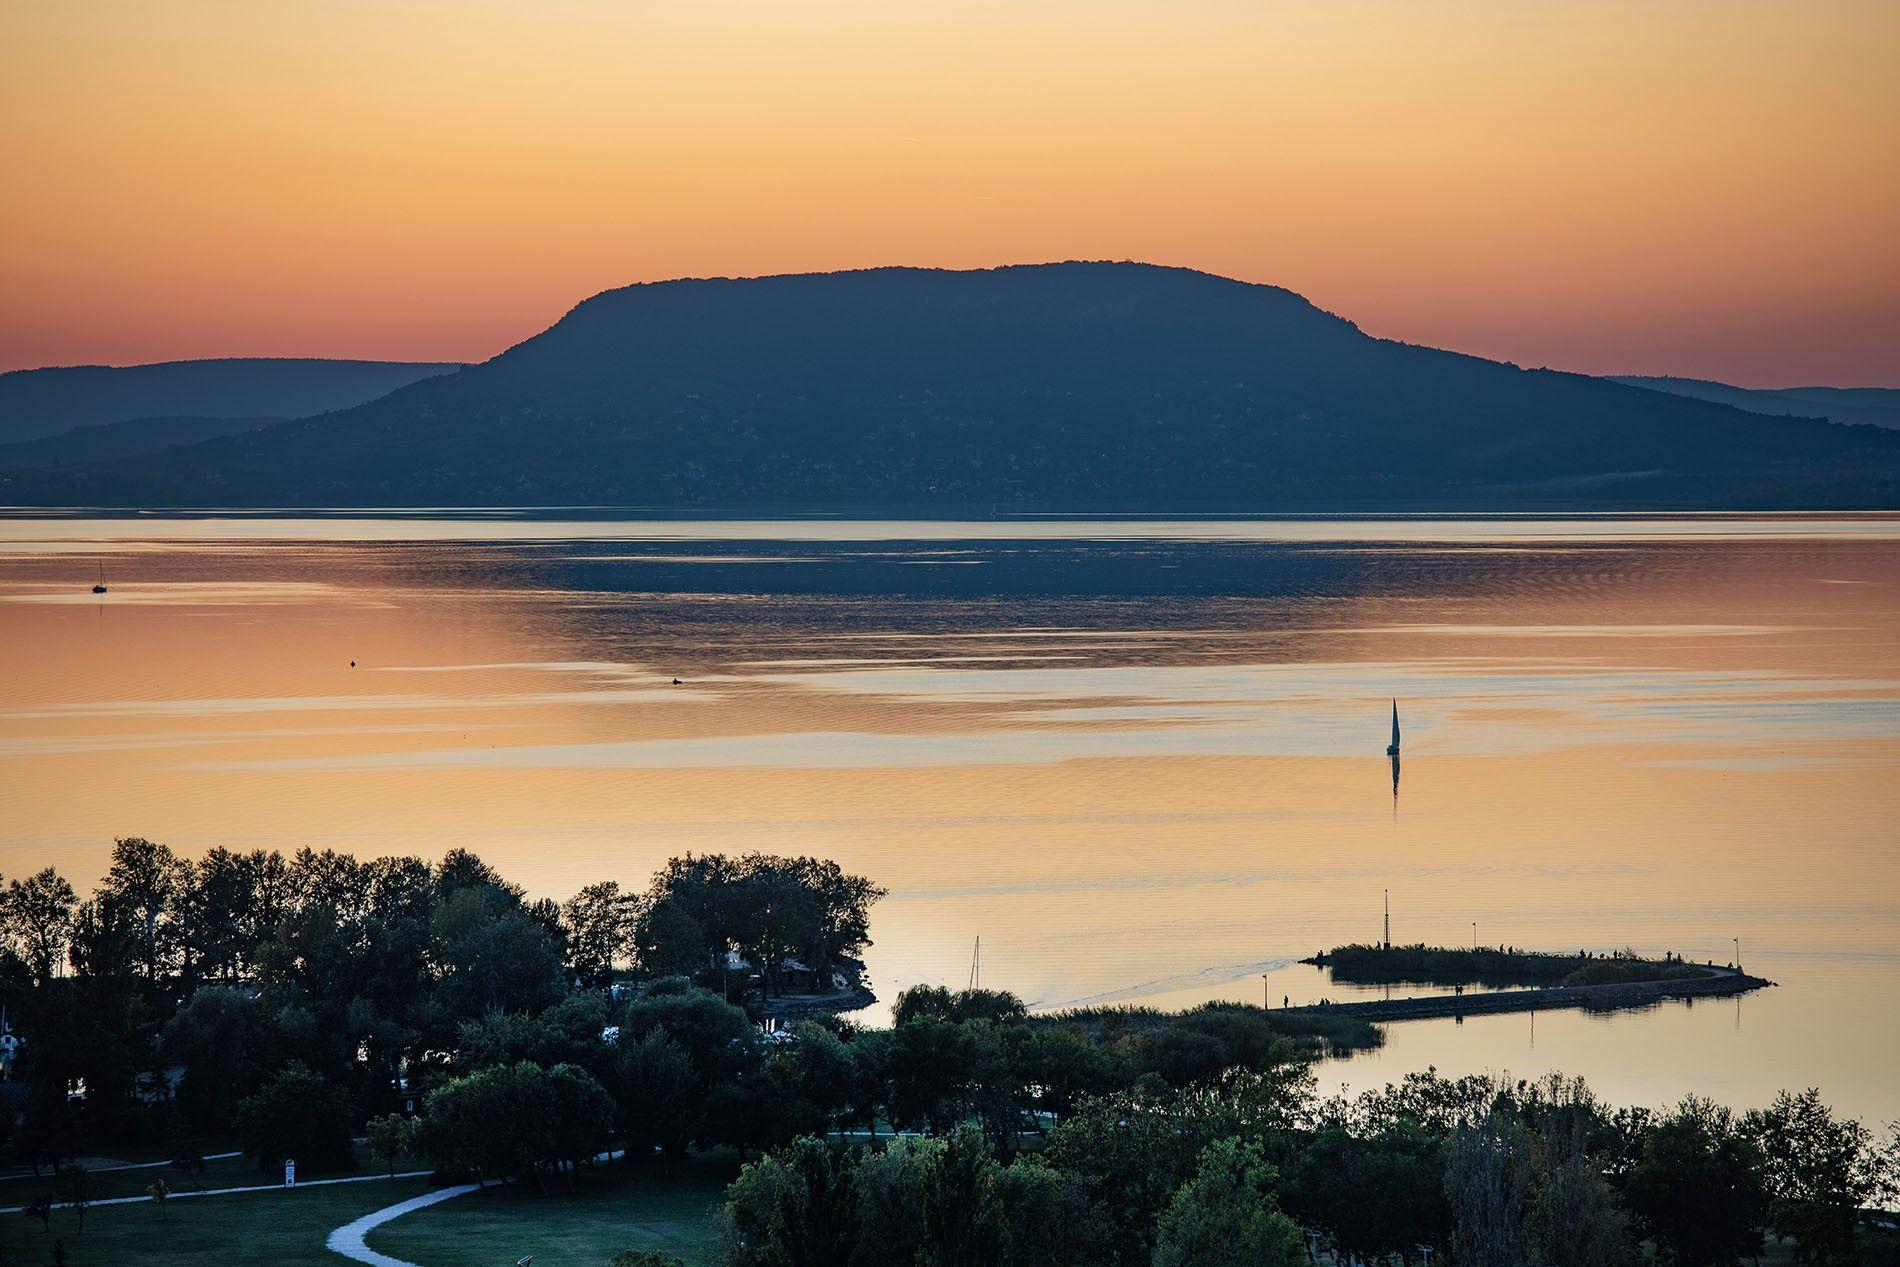 The view from the Millennium Lookout Tower, Gömbkilátó Balatonboglár, at sunset. Deep orangehues envelop the banks ...